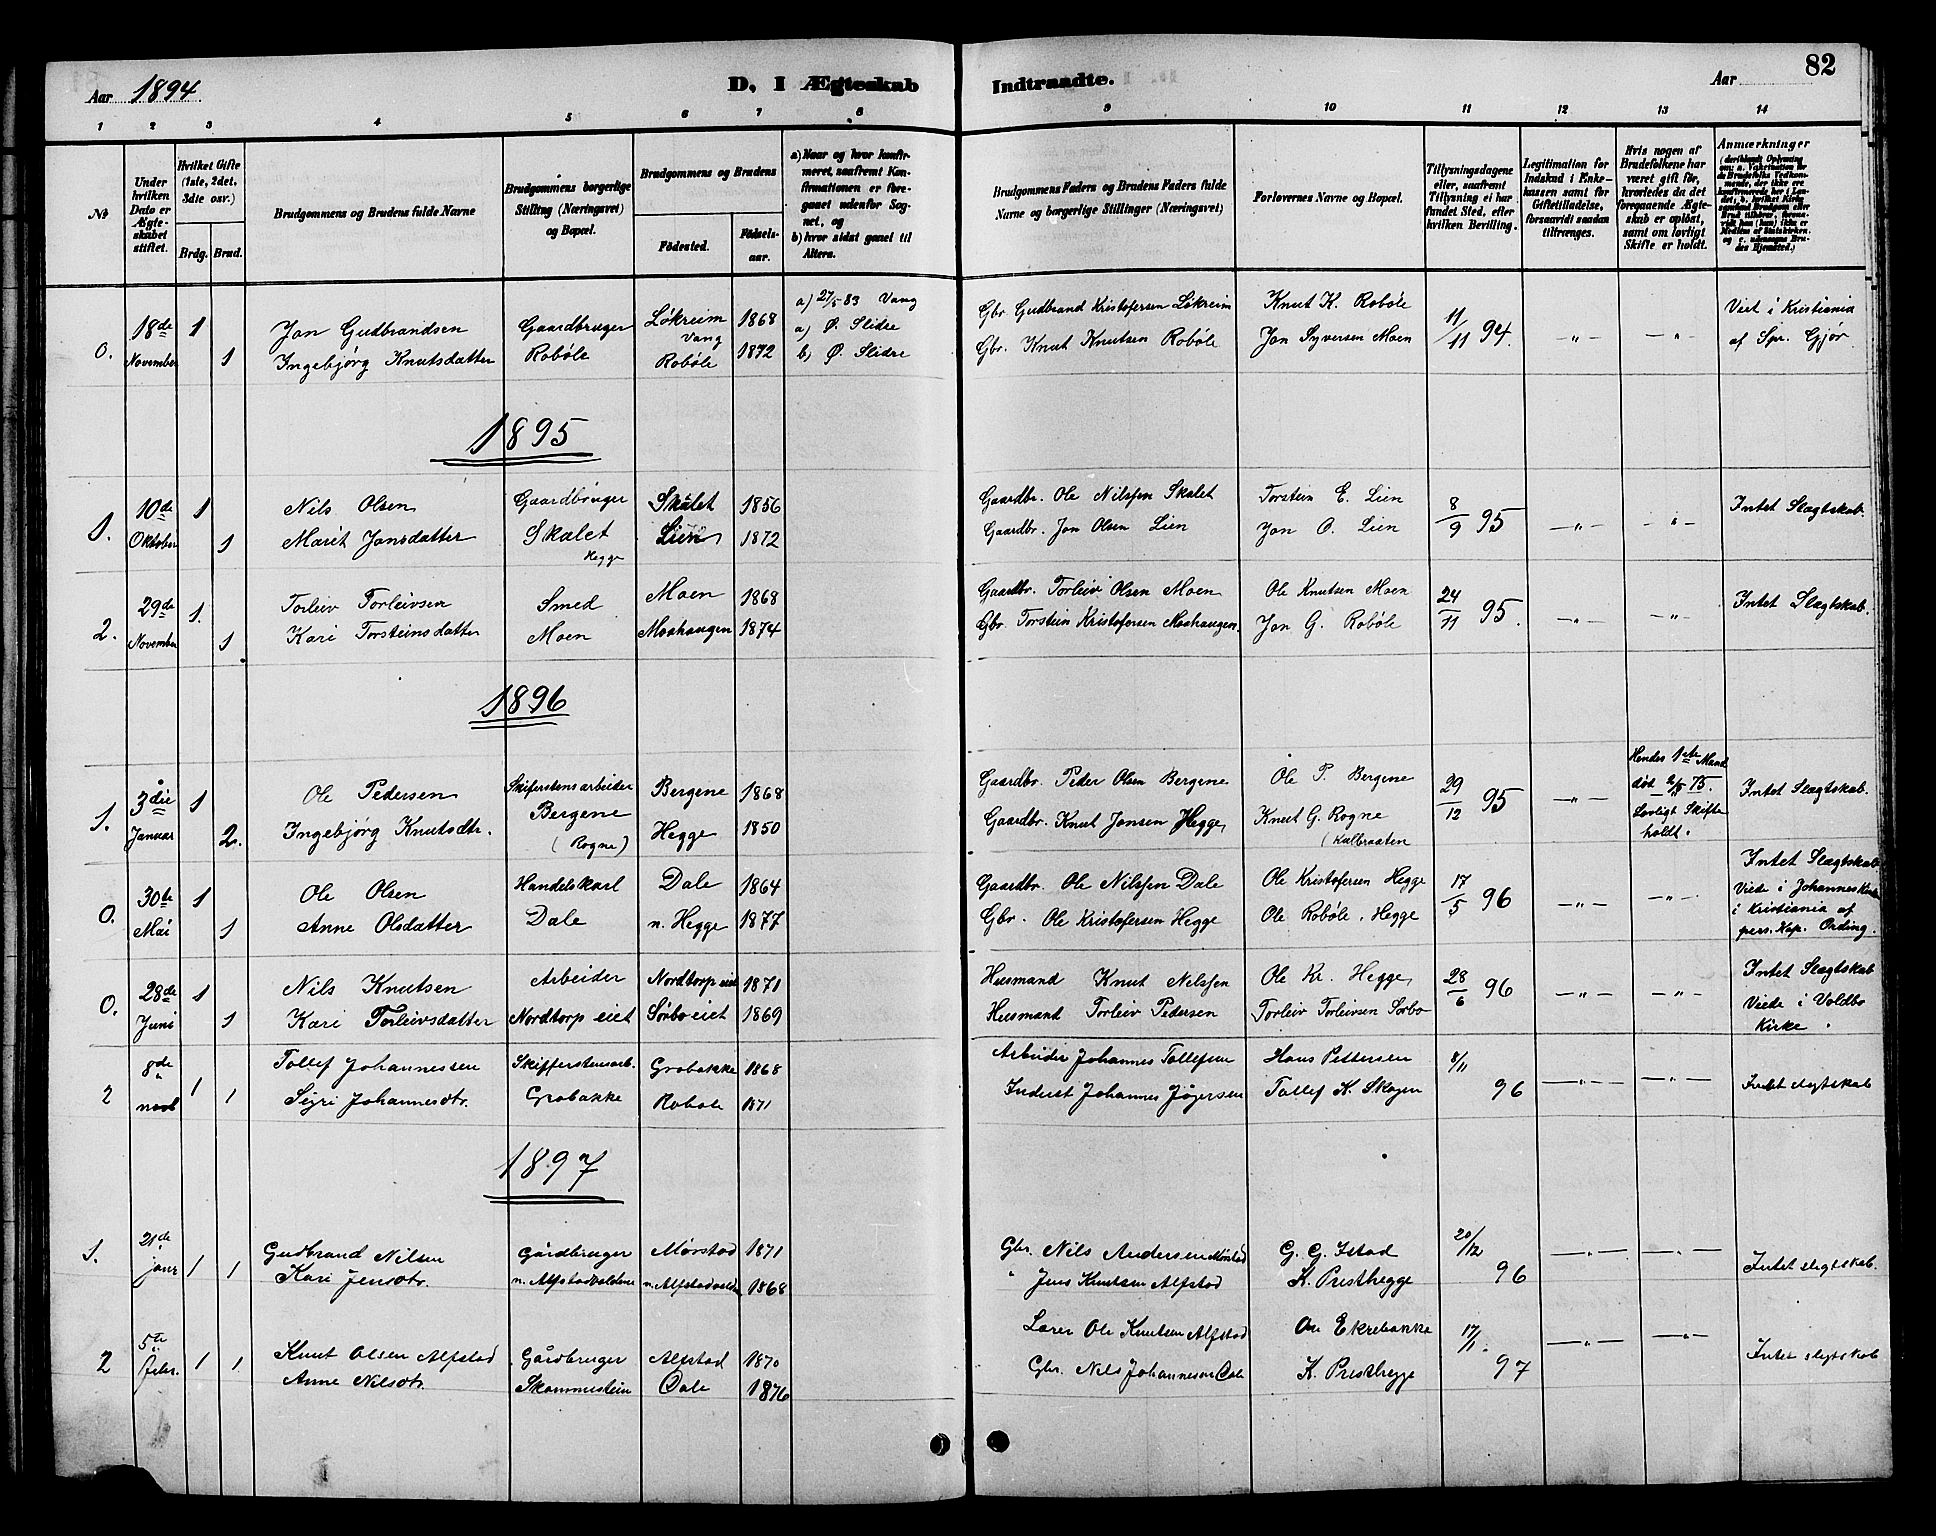 SAH, Øystre Slidre prestekontor, Klokkerbok nr. 4, 1887-1907, s. 82